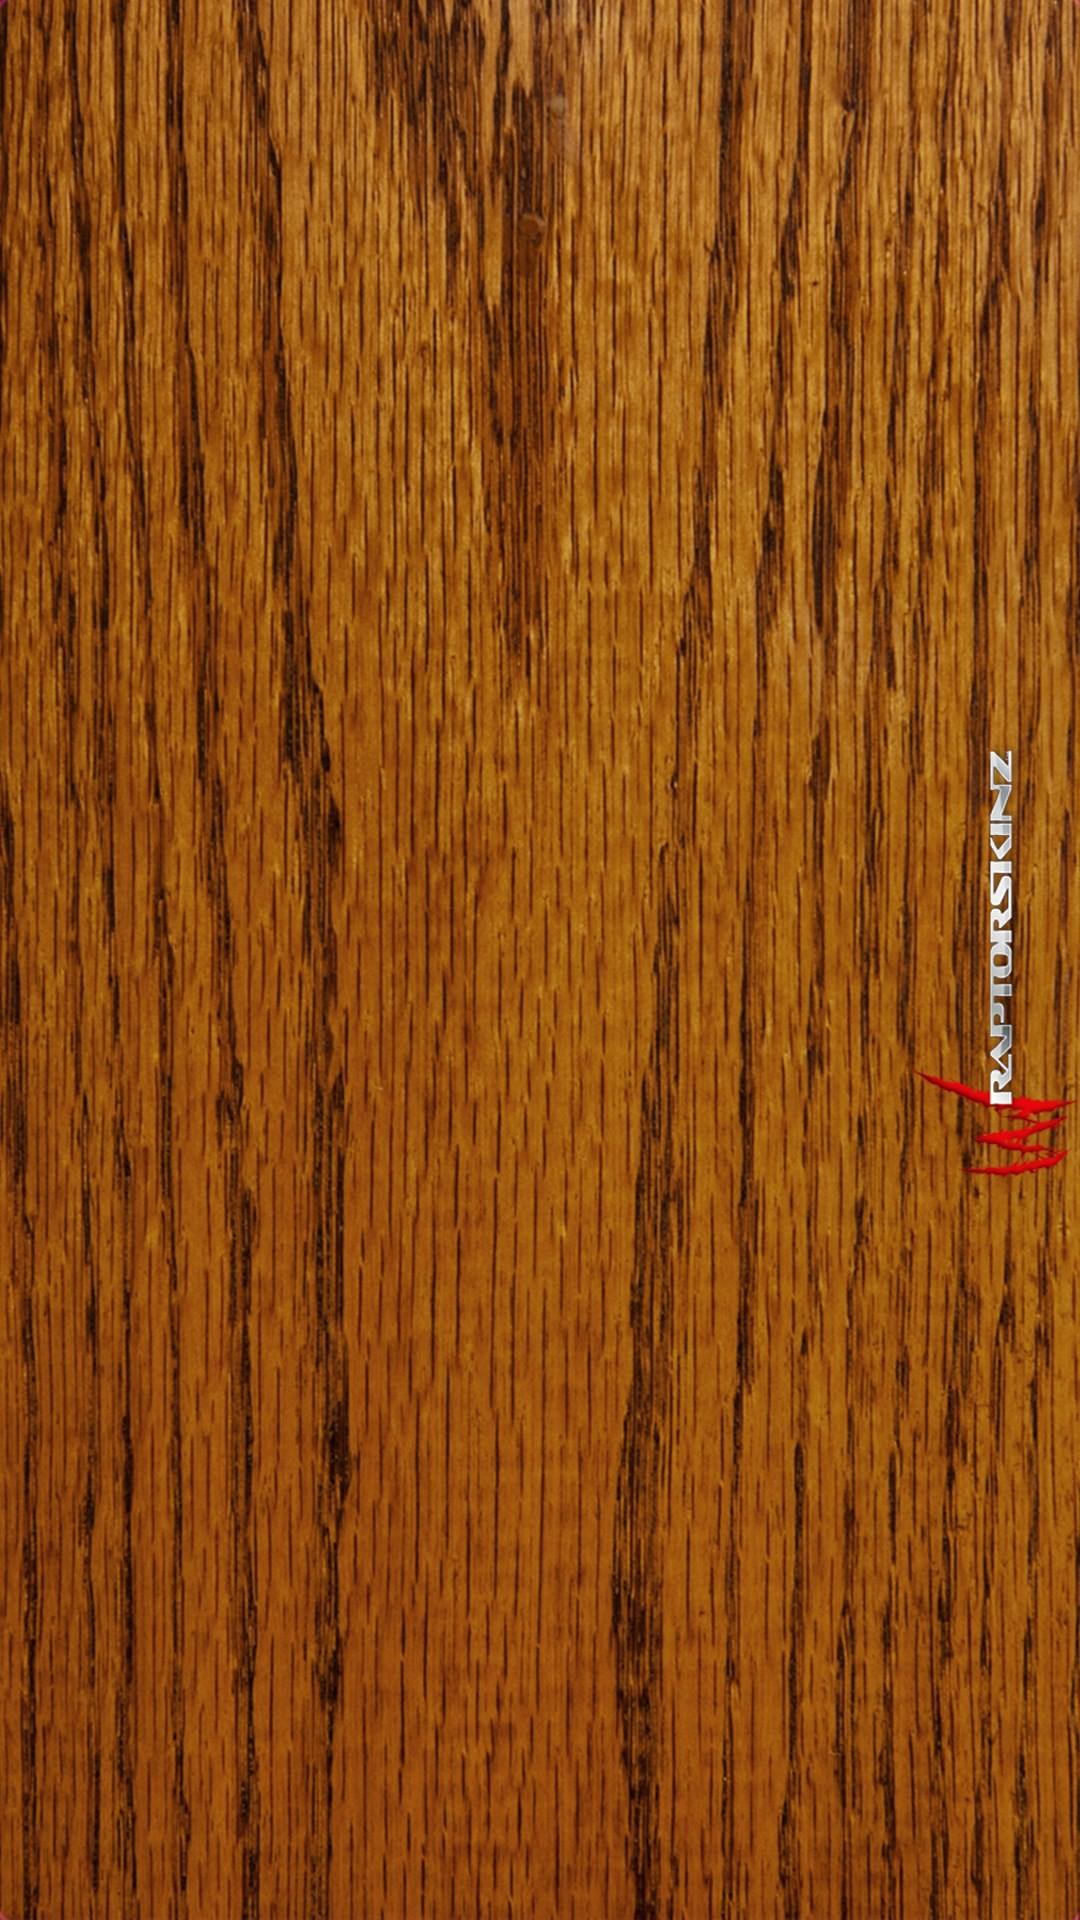 Wood Grain – Oak 01 – … pic source